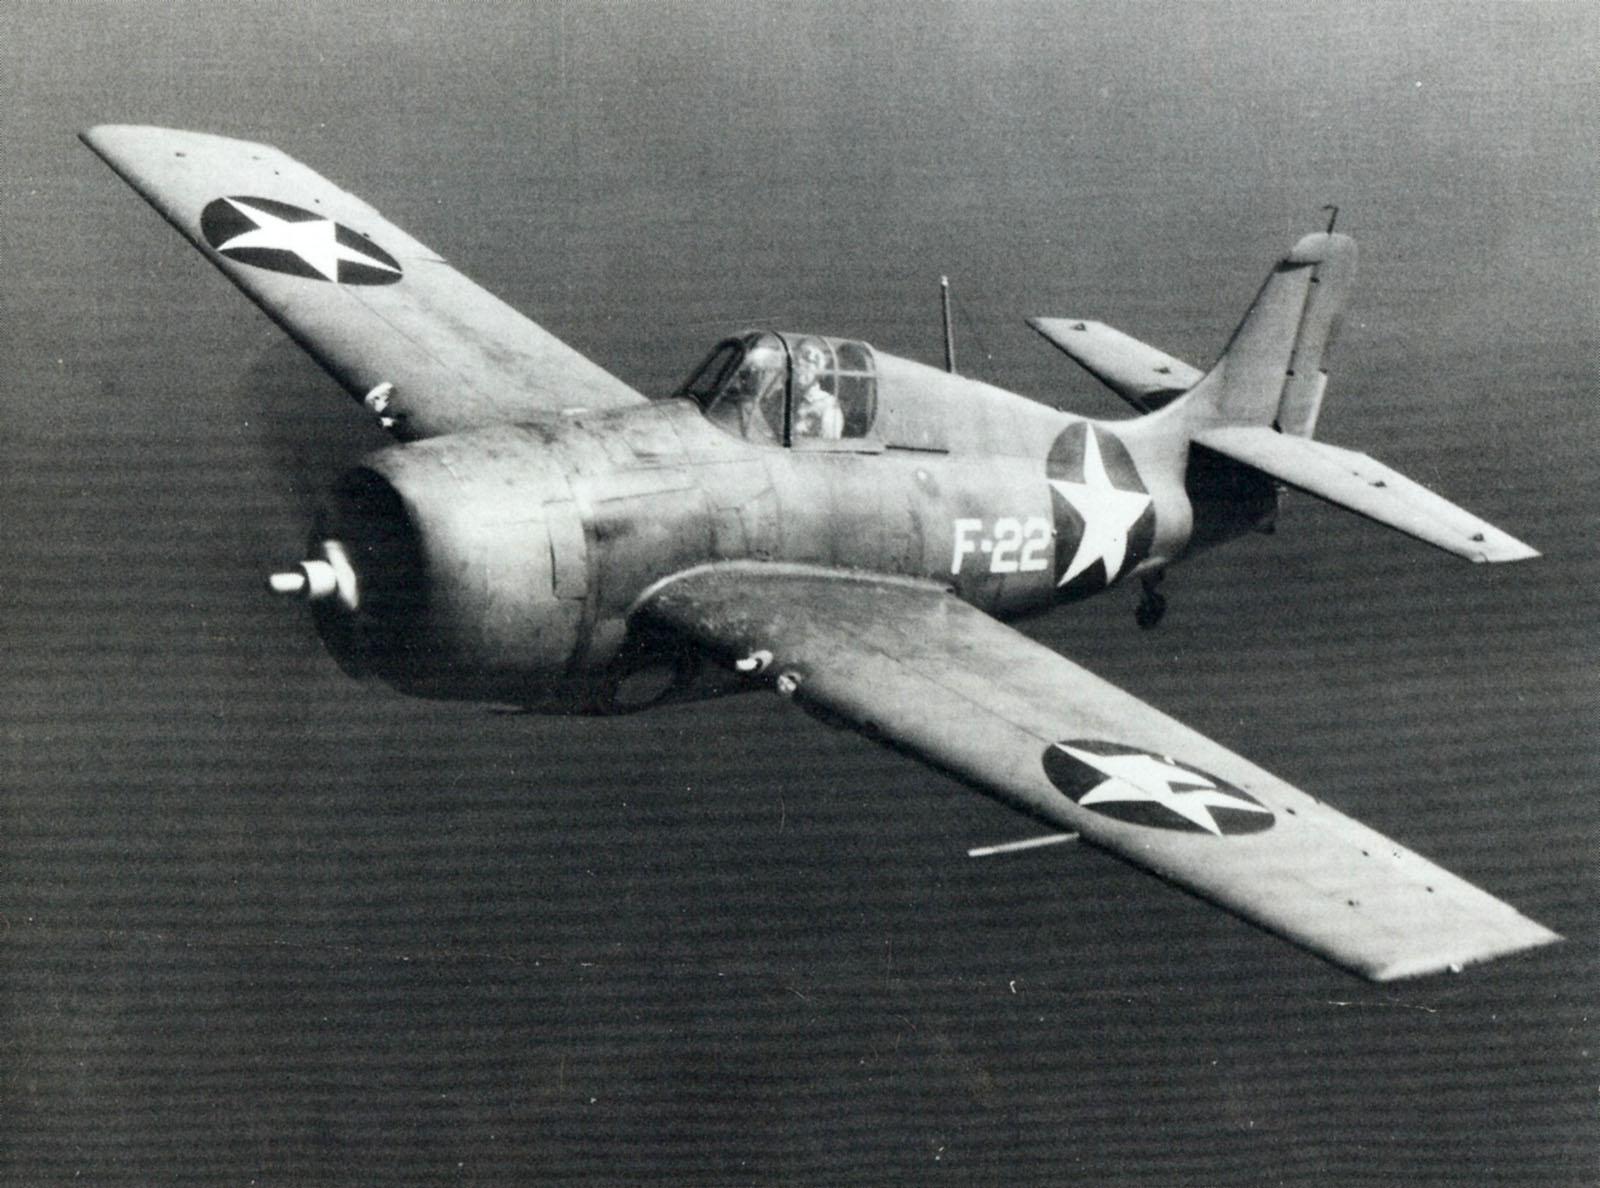 Grumman F4F 3 Wildcat White F22 in flight circa 1942 43 01